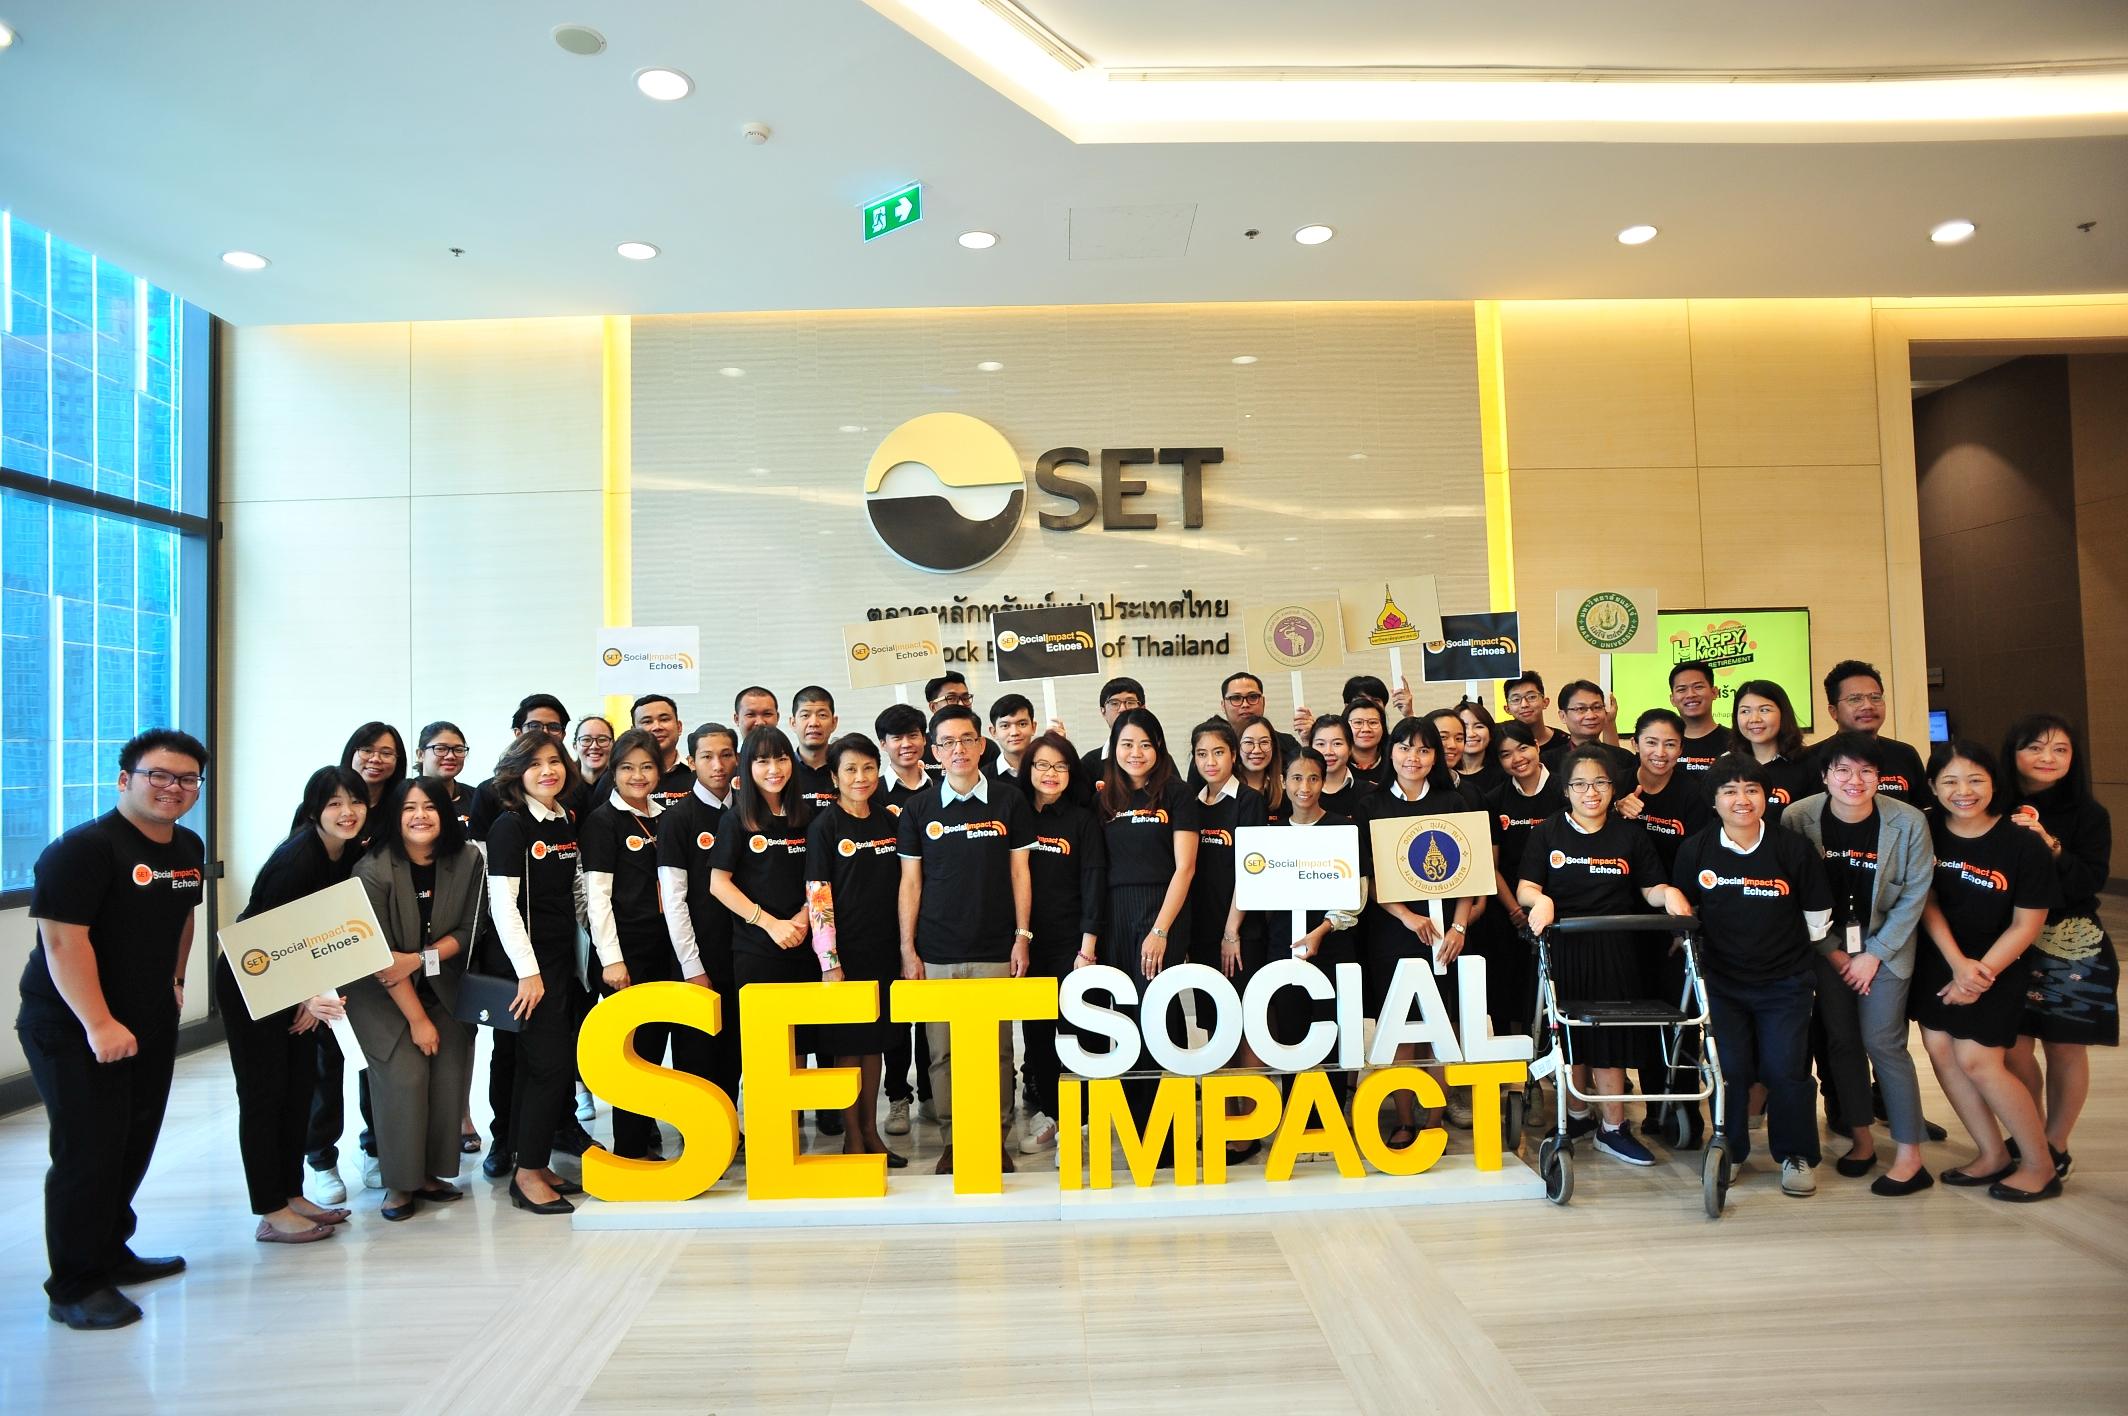 """Impact Echoes"" โครงการประเมินผลลัพธ์ทางสังคม"